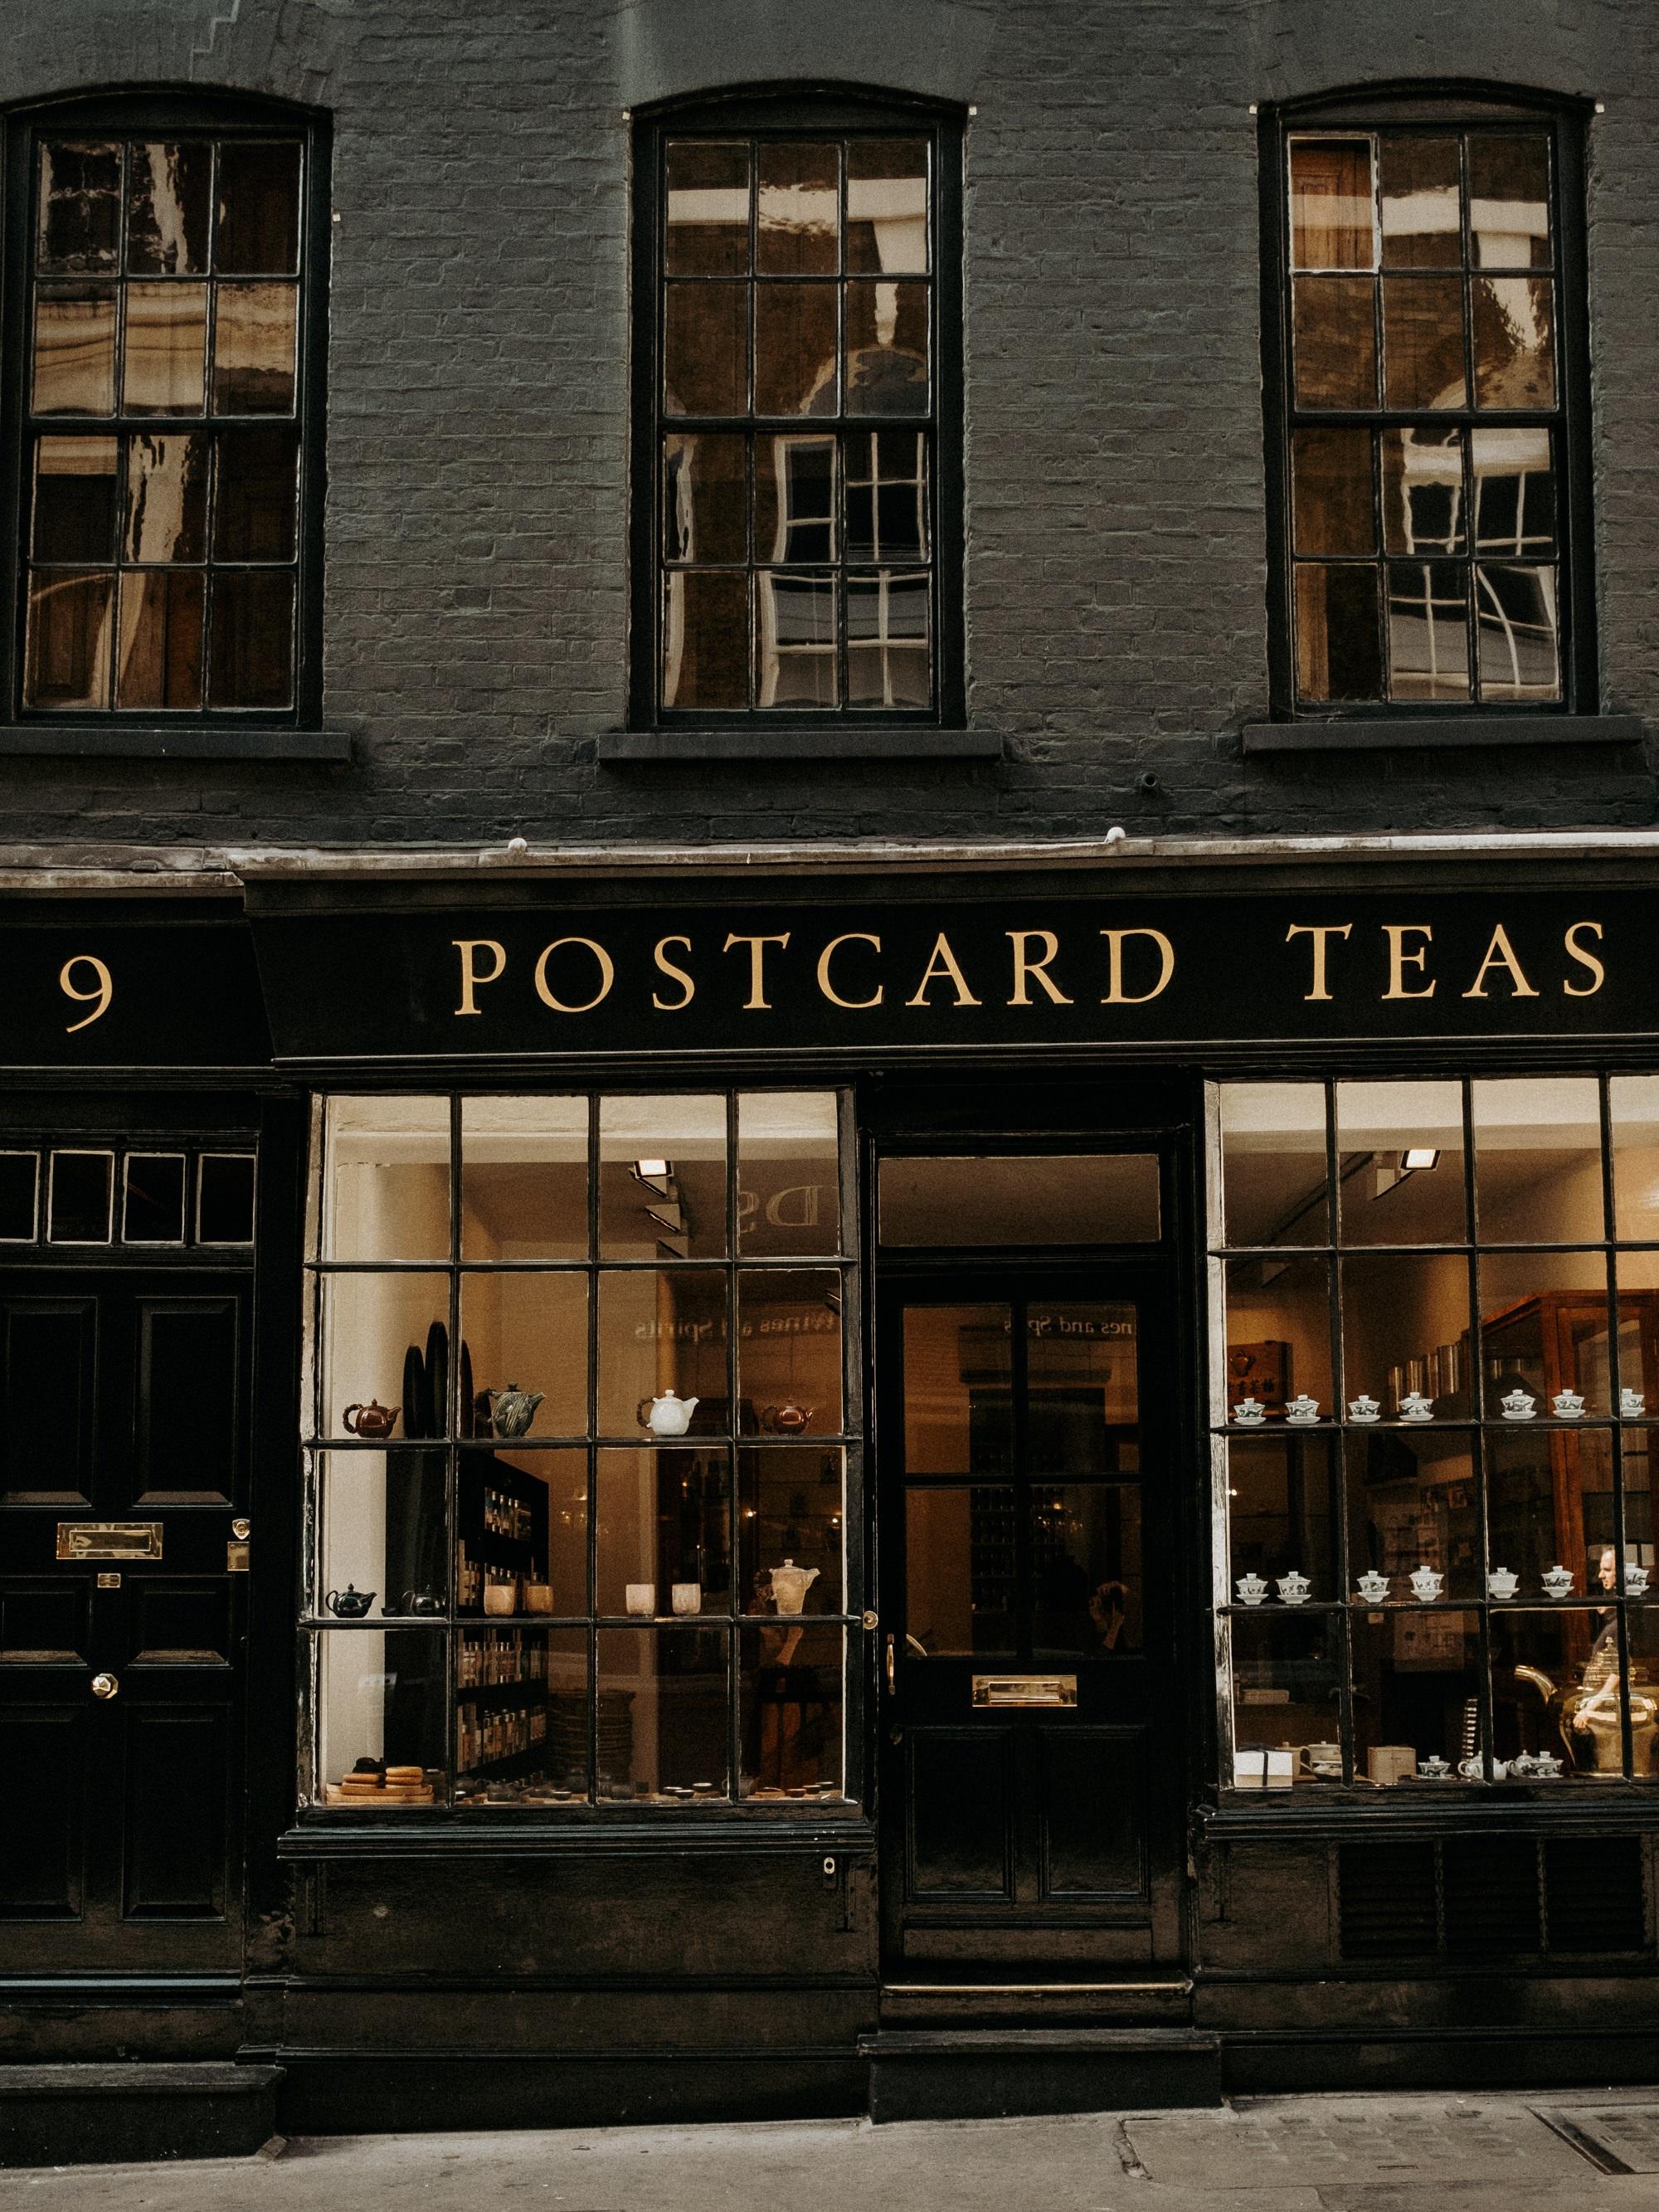 postcard-teas-london